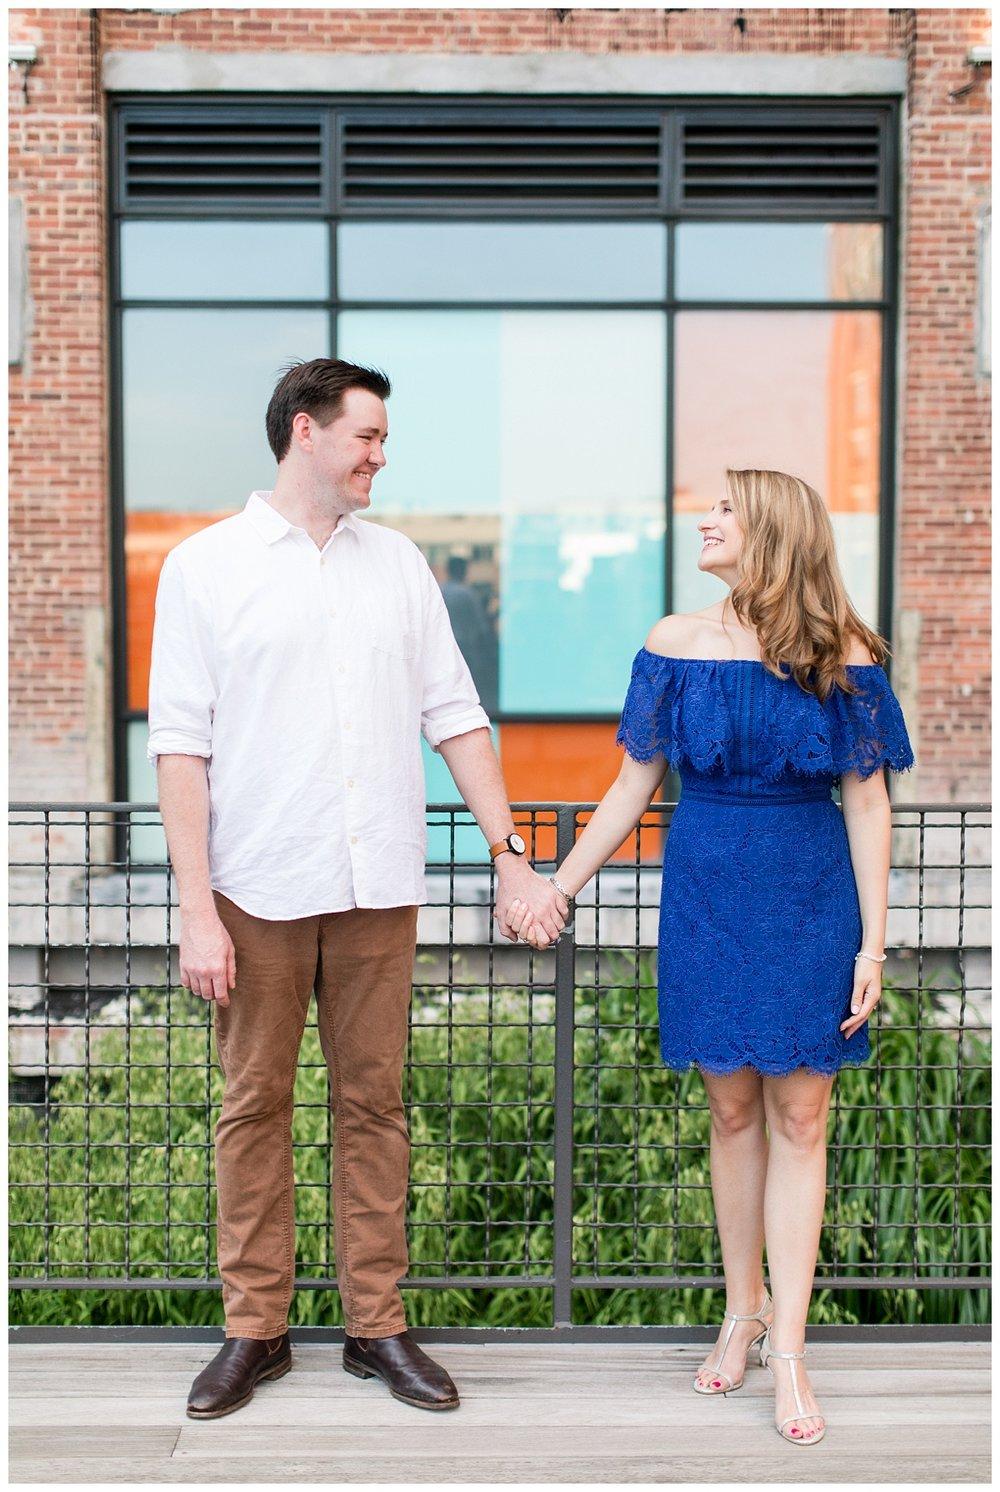 Engagement Pictures_KIm and Hamish_Abby Breaux Photography_Atlanta_Ponce City Market_Jackson Street Bridge_0037.jpg